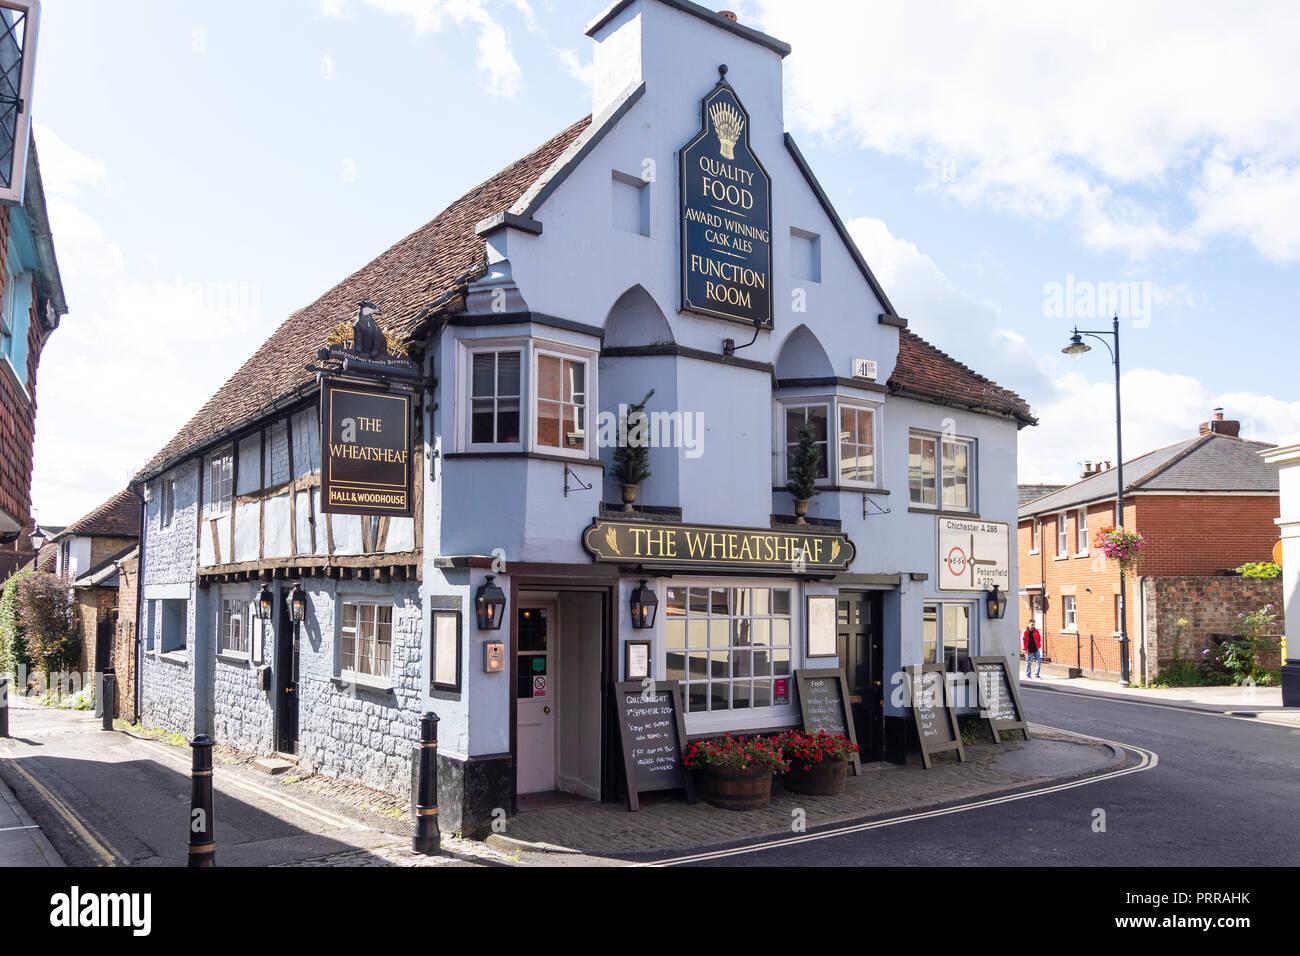 15th century The Wheatsheaf Pub, Wool Lane, Midhurst, West Sussex, England, United Kingdom - Stock Image